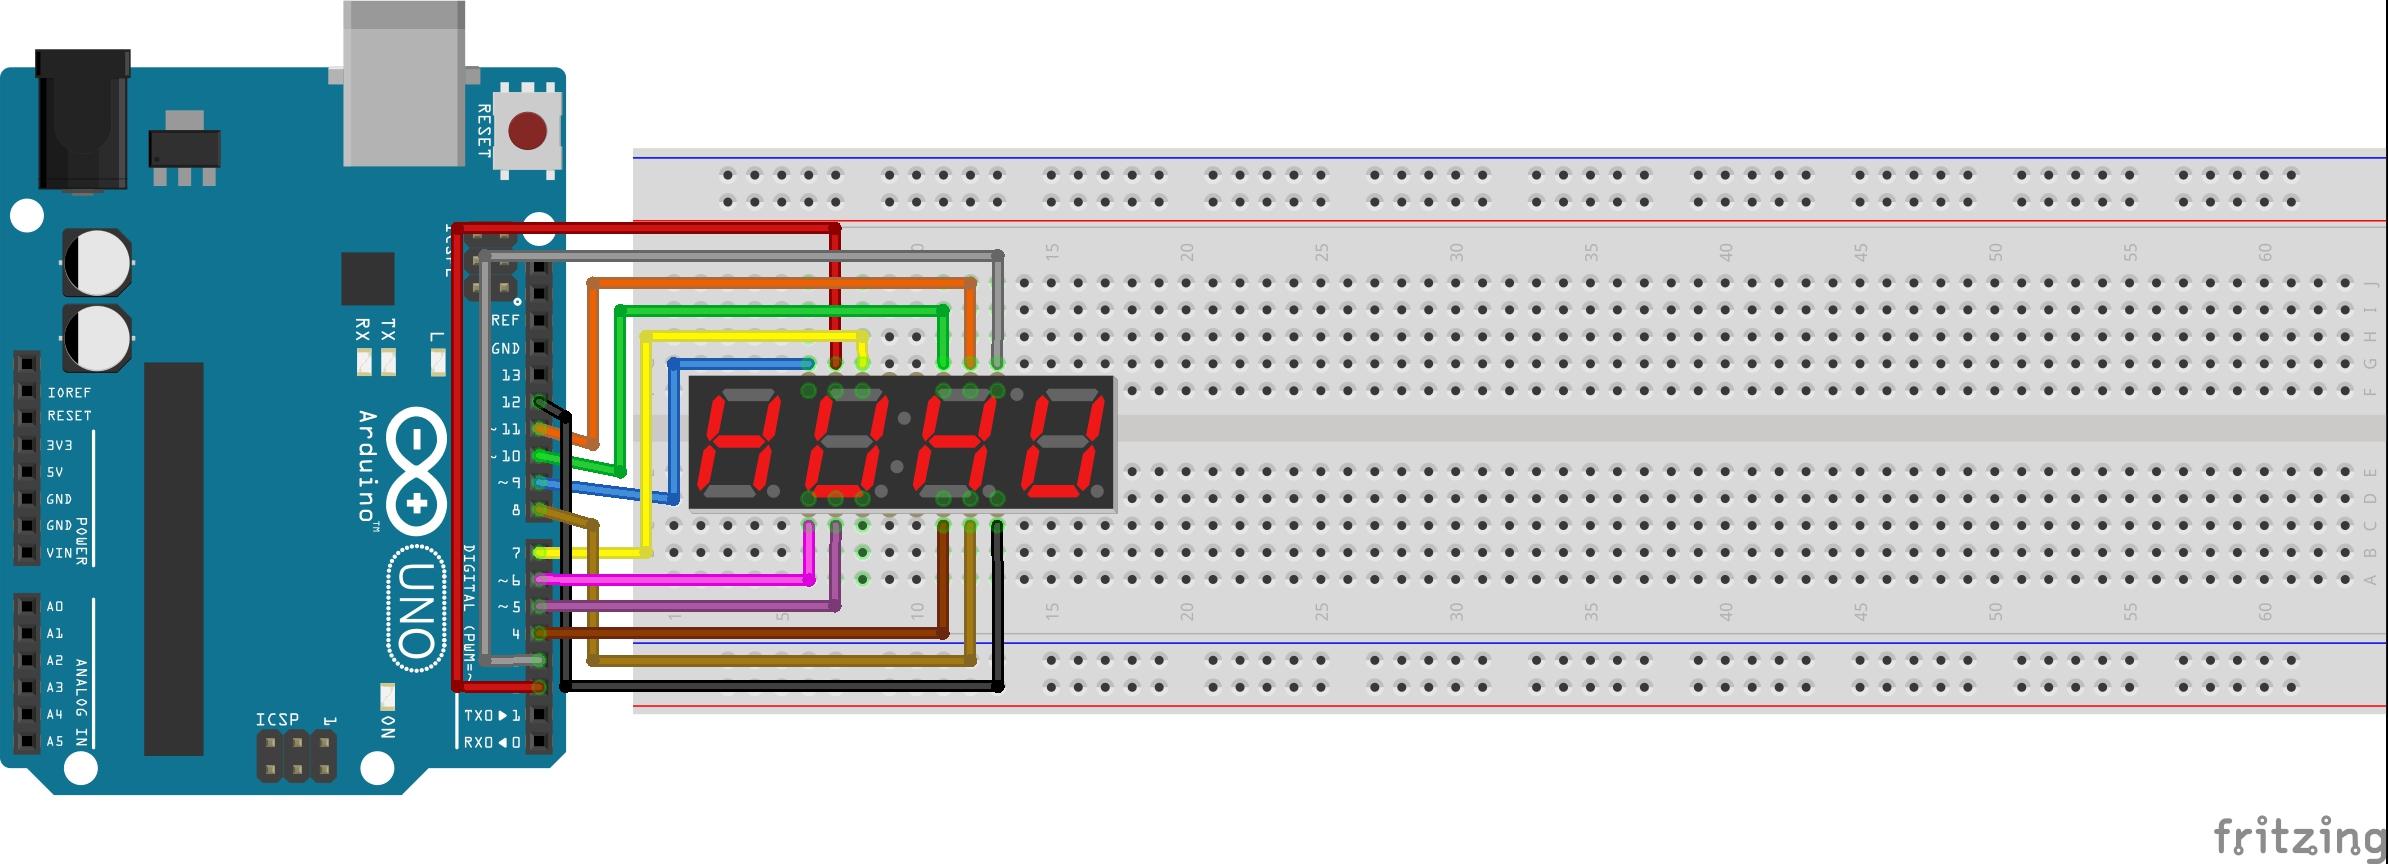 4 digit 7 segment display connections kasufbbpfq